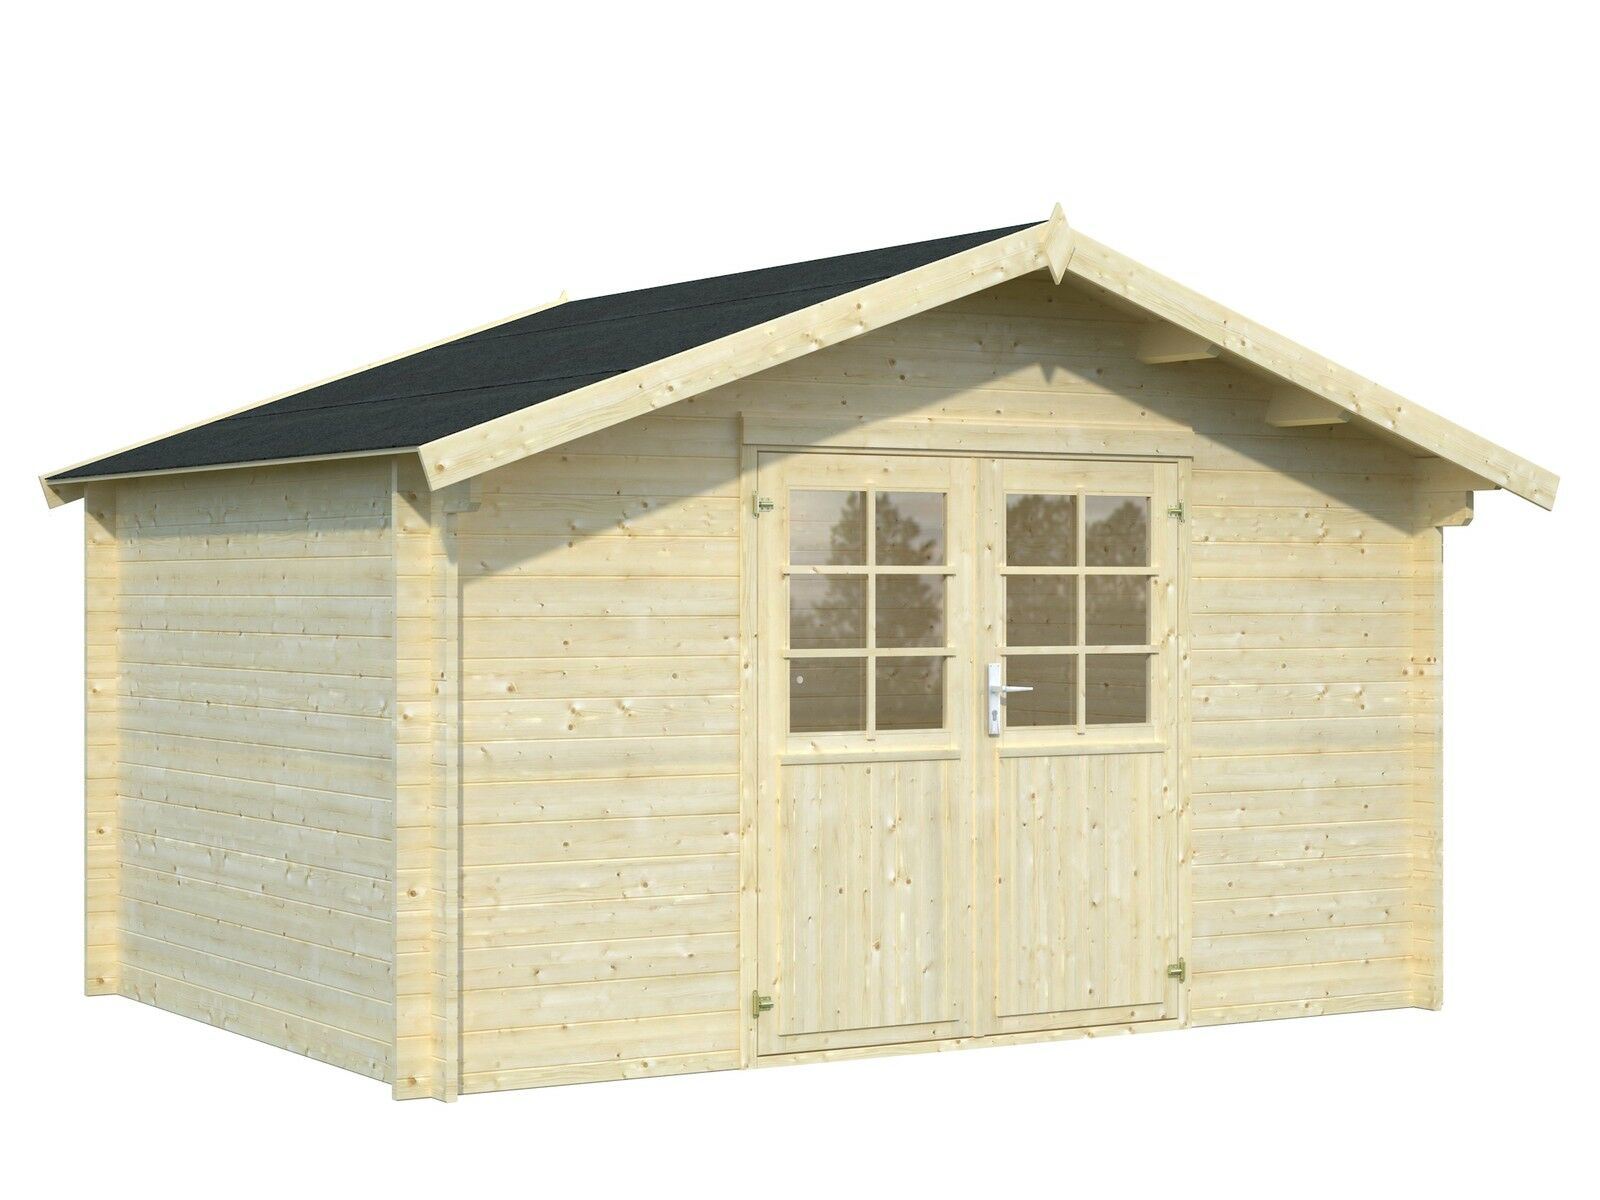 34mm gartenhaus greta ca 400x300 cm ger tehaus blockhaus holzhaus holz schuppen eur 899 00. Black Bedroom Furniture Sets. Home Design Ideas